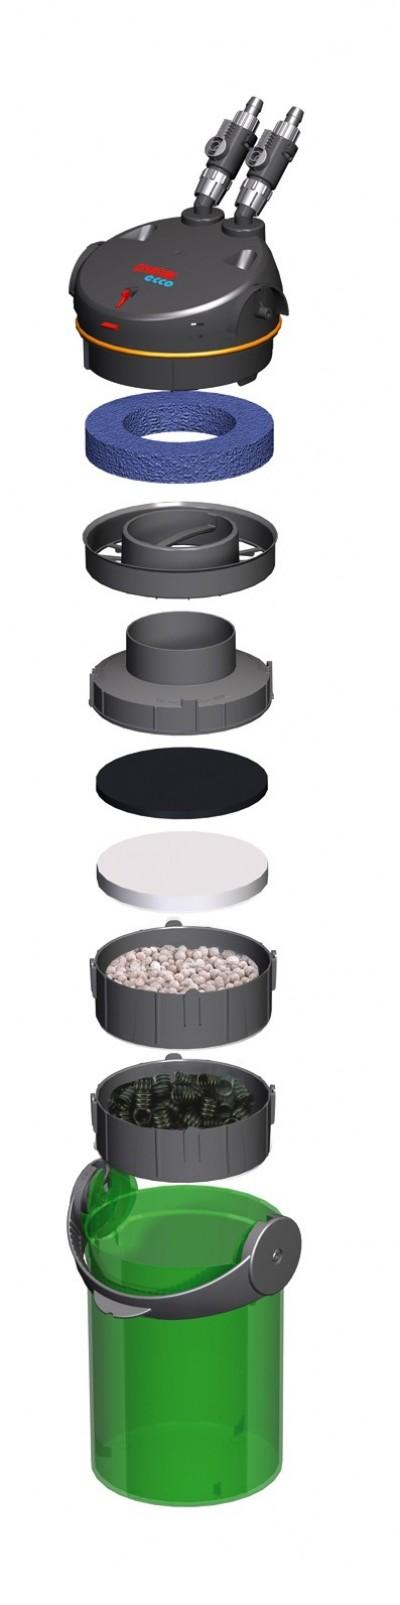 Filtro Canister Eheim Ecco Easy 60 - 600 L/h ( 2234 ) 110v